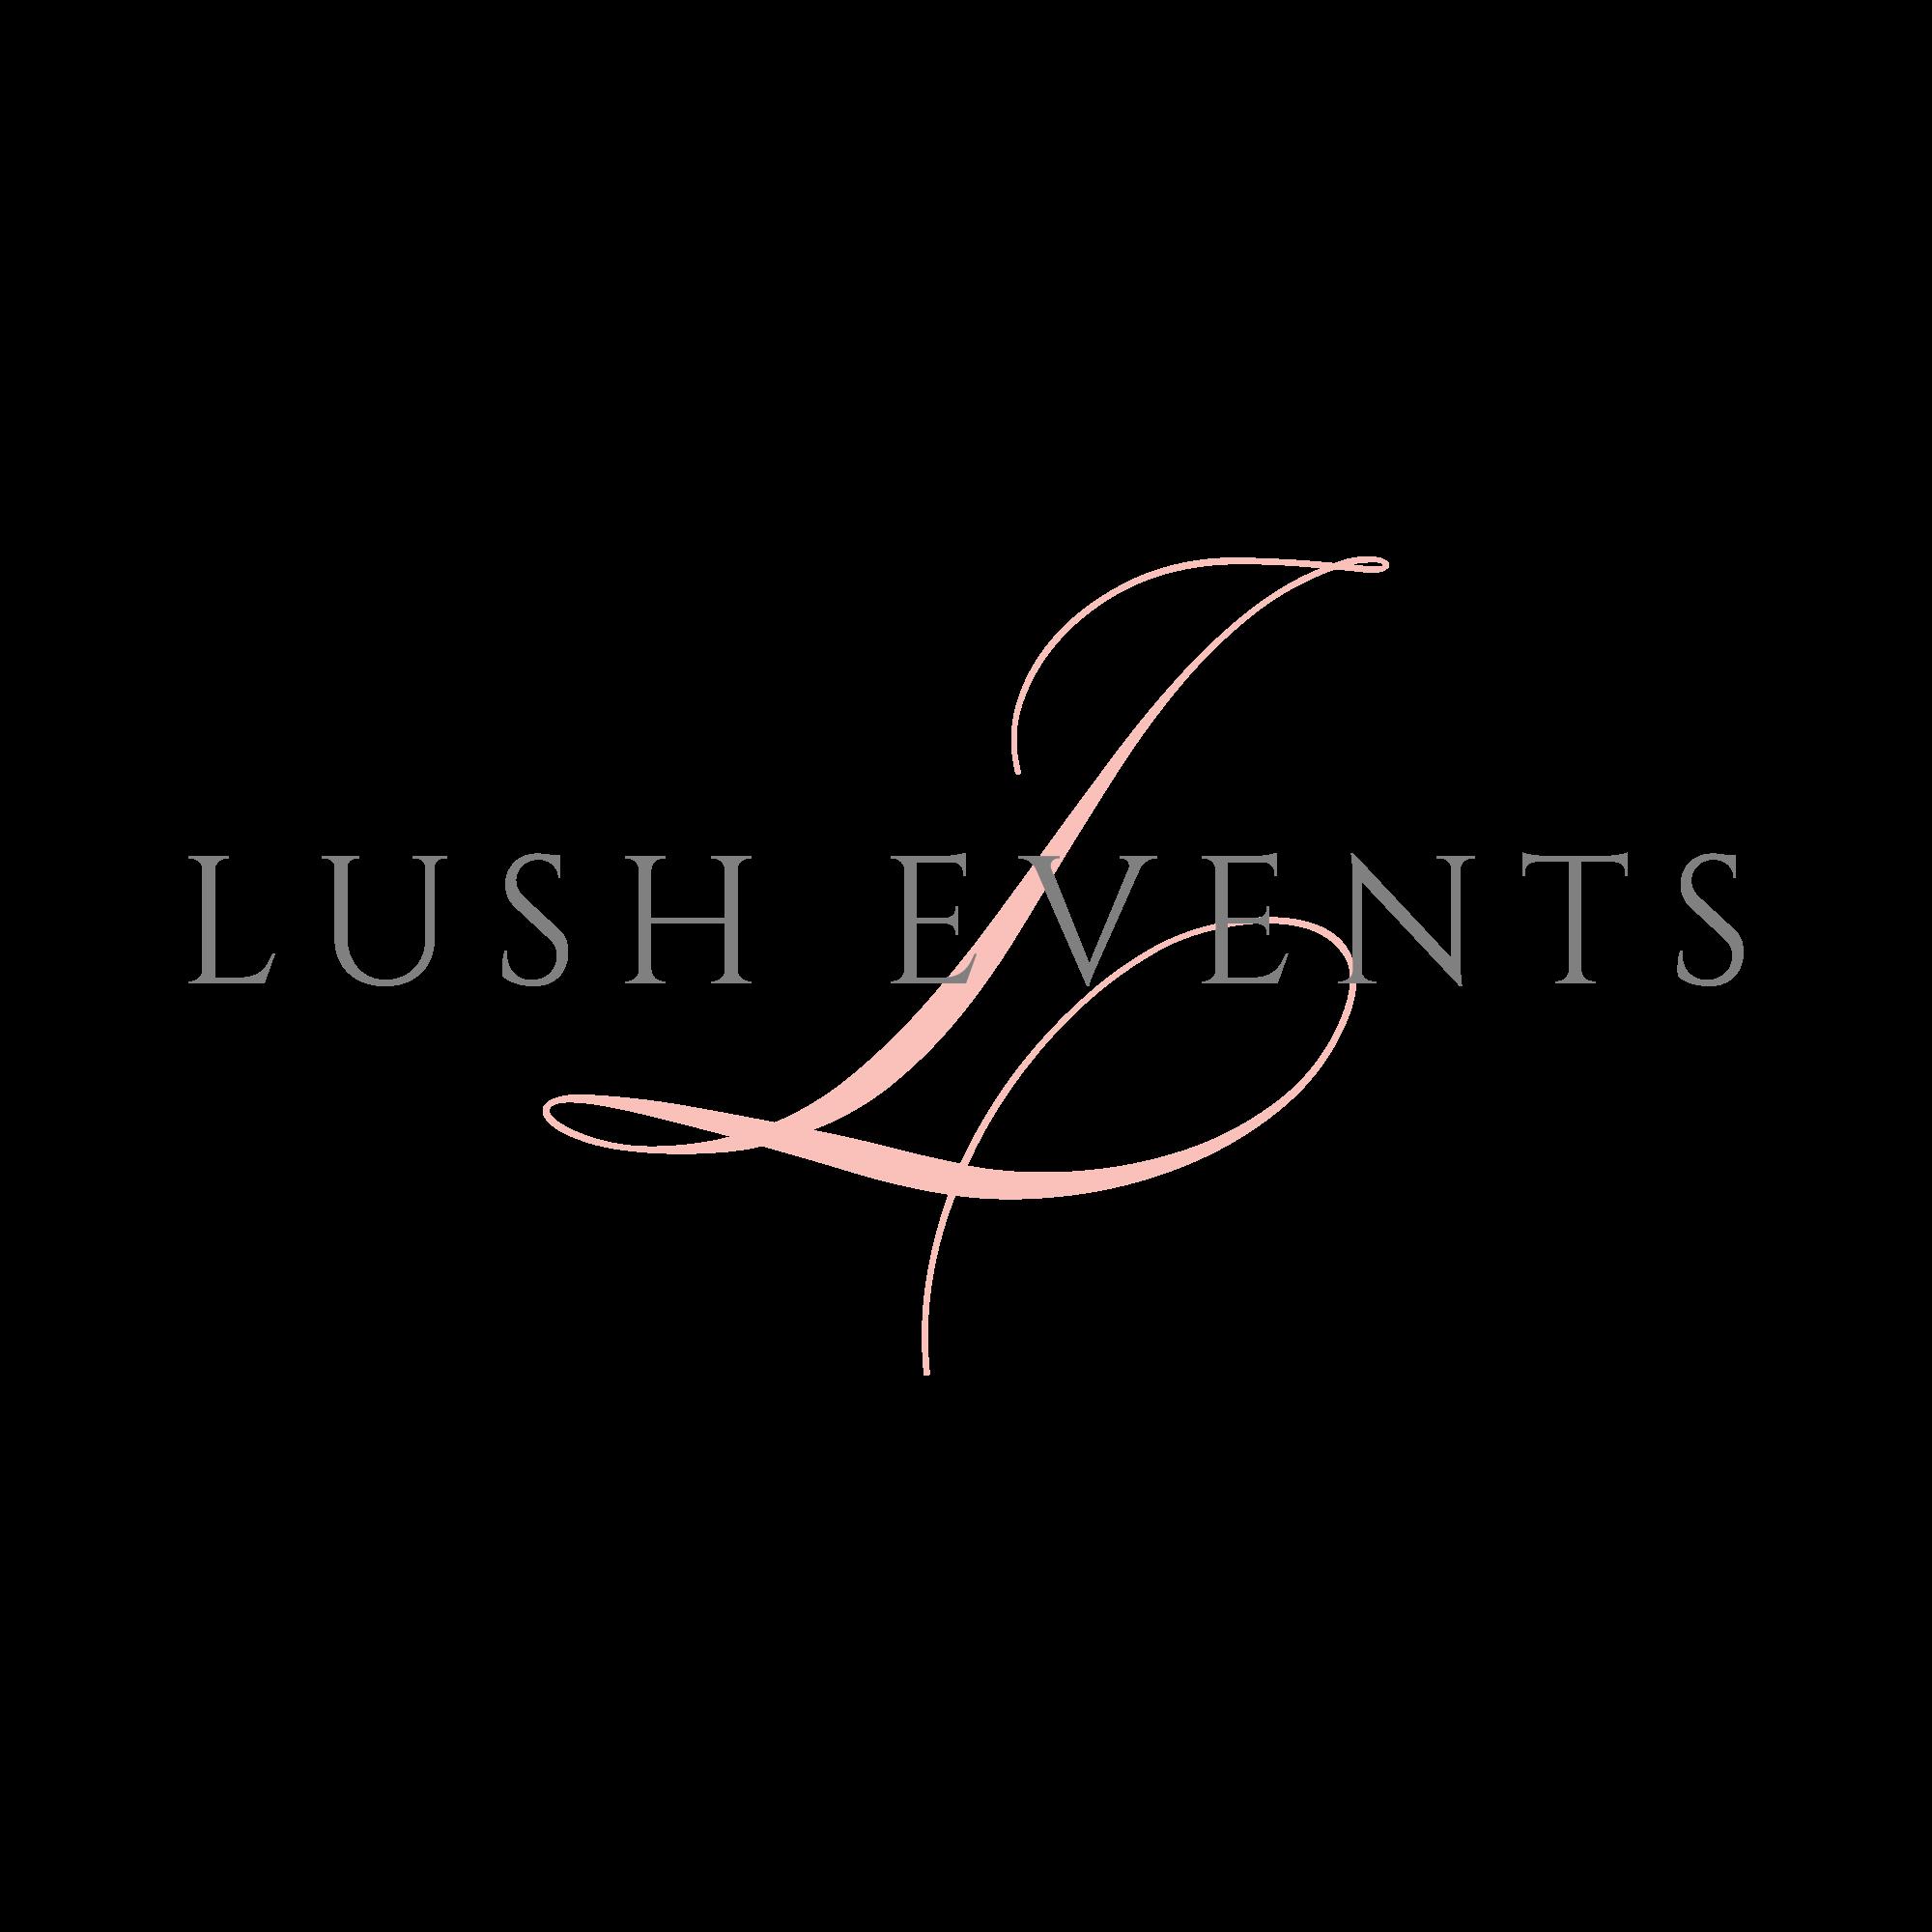 lush events